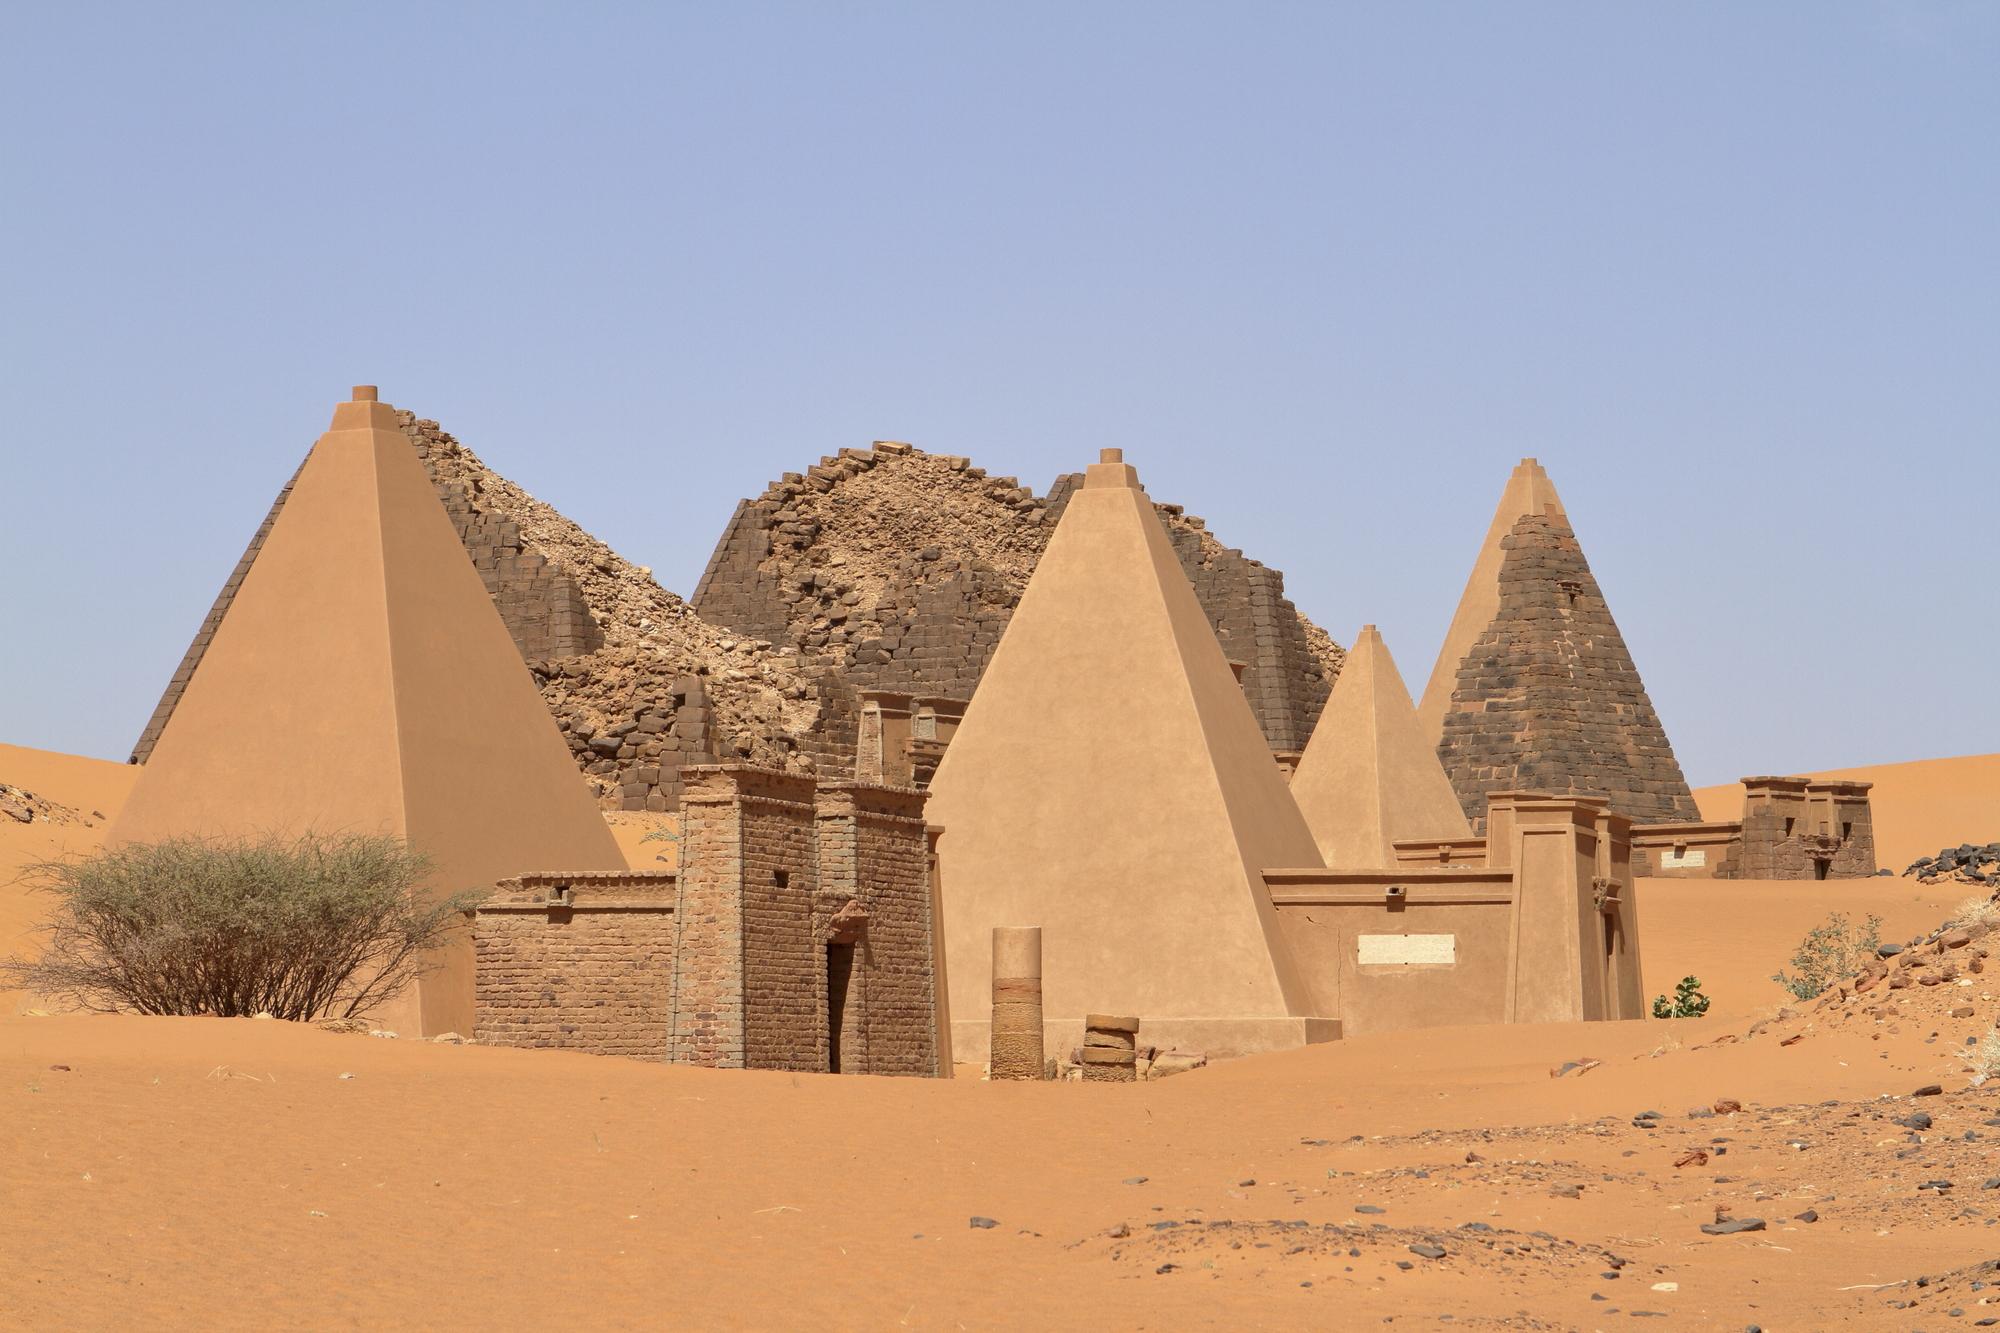 Ägypten - Sudan überland